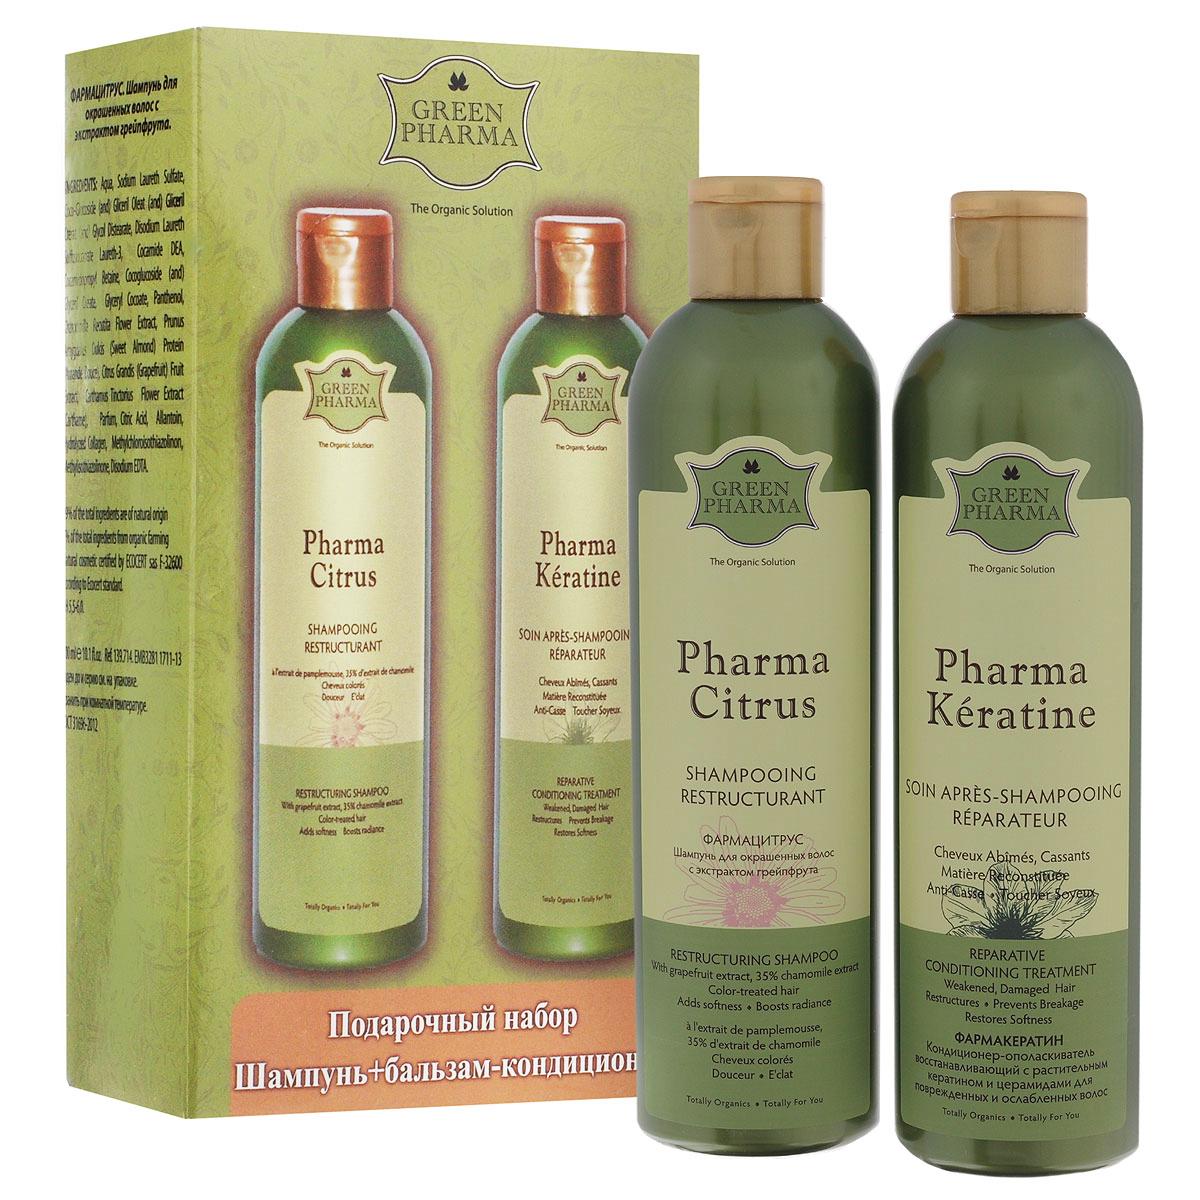 Greenpharma Подарочный набор №3: шампунь Pharma Citrus, кондиционер-ополаскиватель Pharma Keratine, 2х300 мл восстанавливающий уход без смывания absolue keratine 100 мл